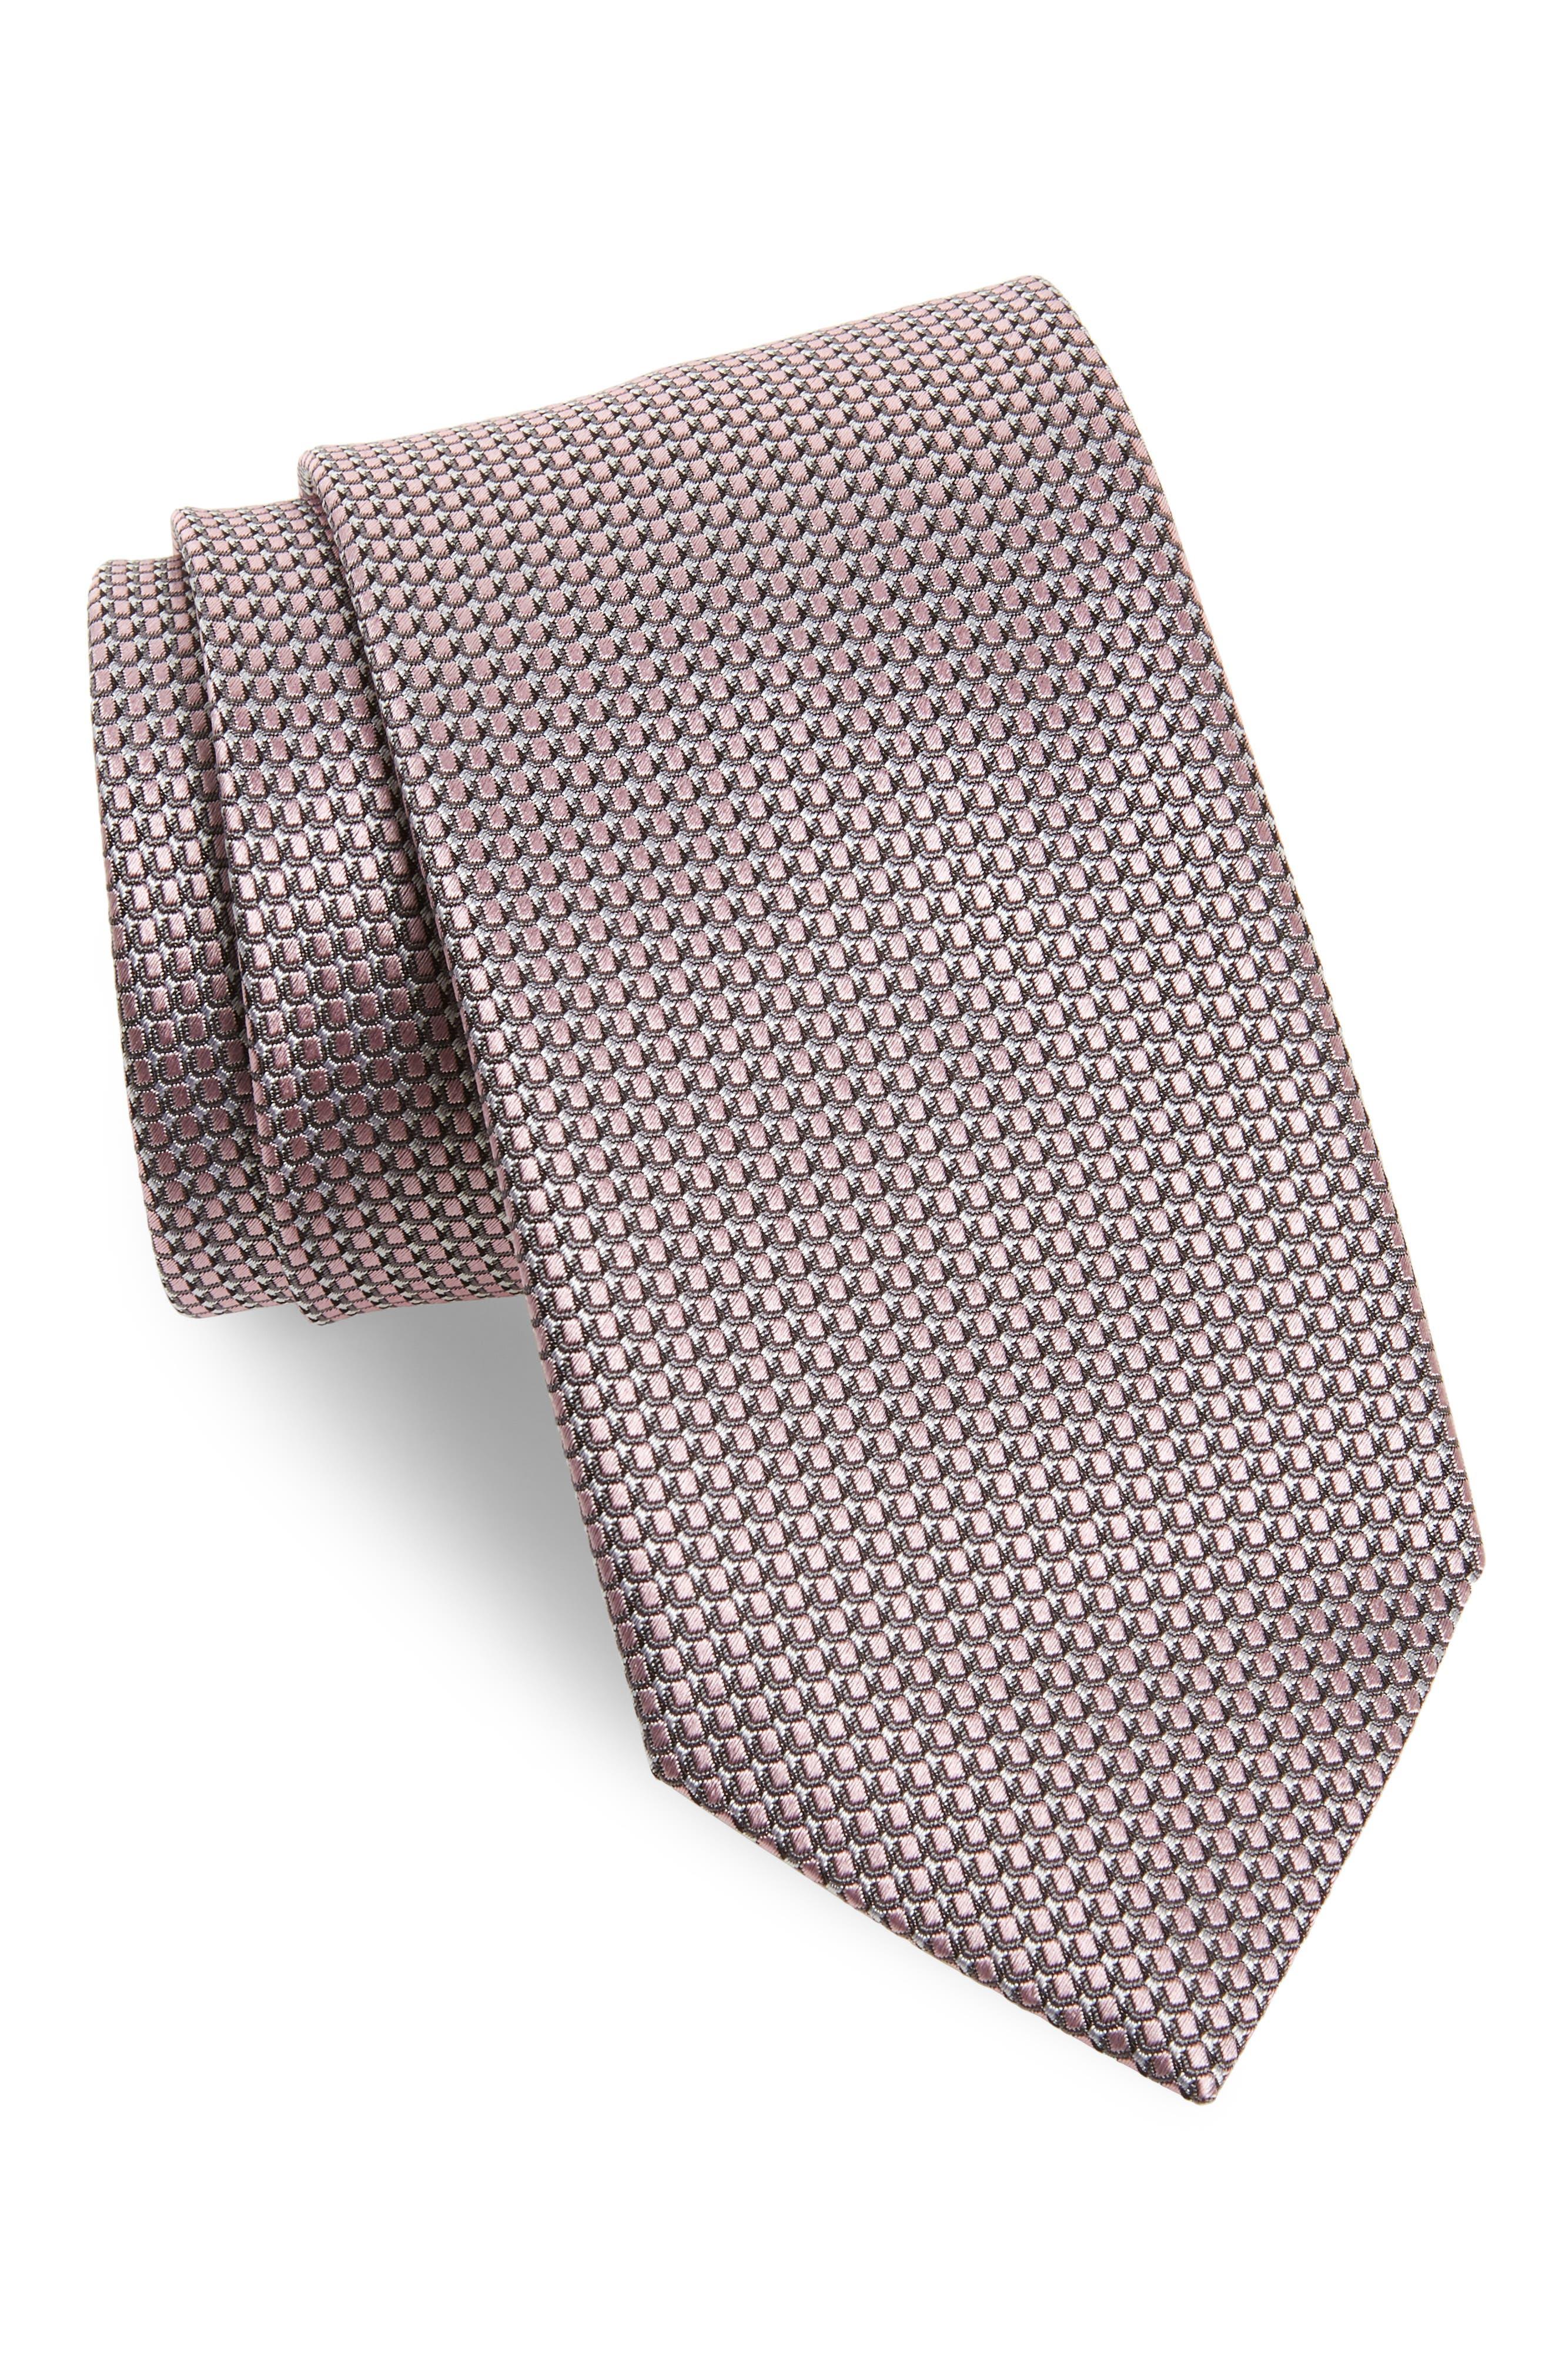 Solid Silk Tie,                             Main thumbnail 1, color,                             Pink/ Grey